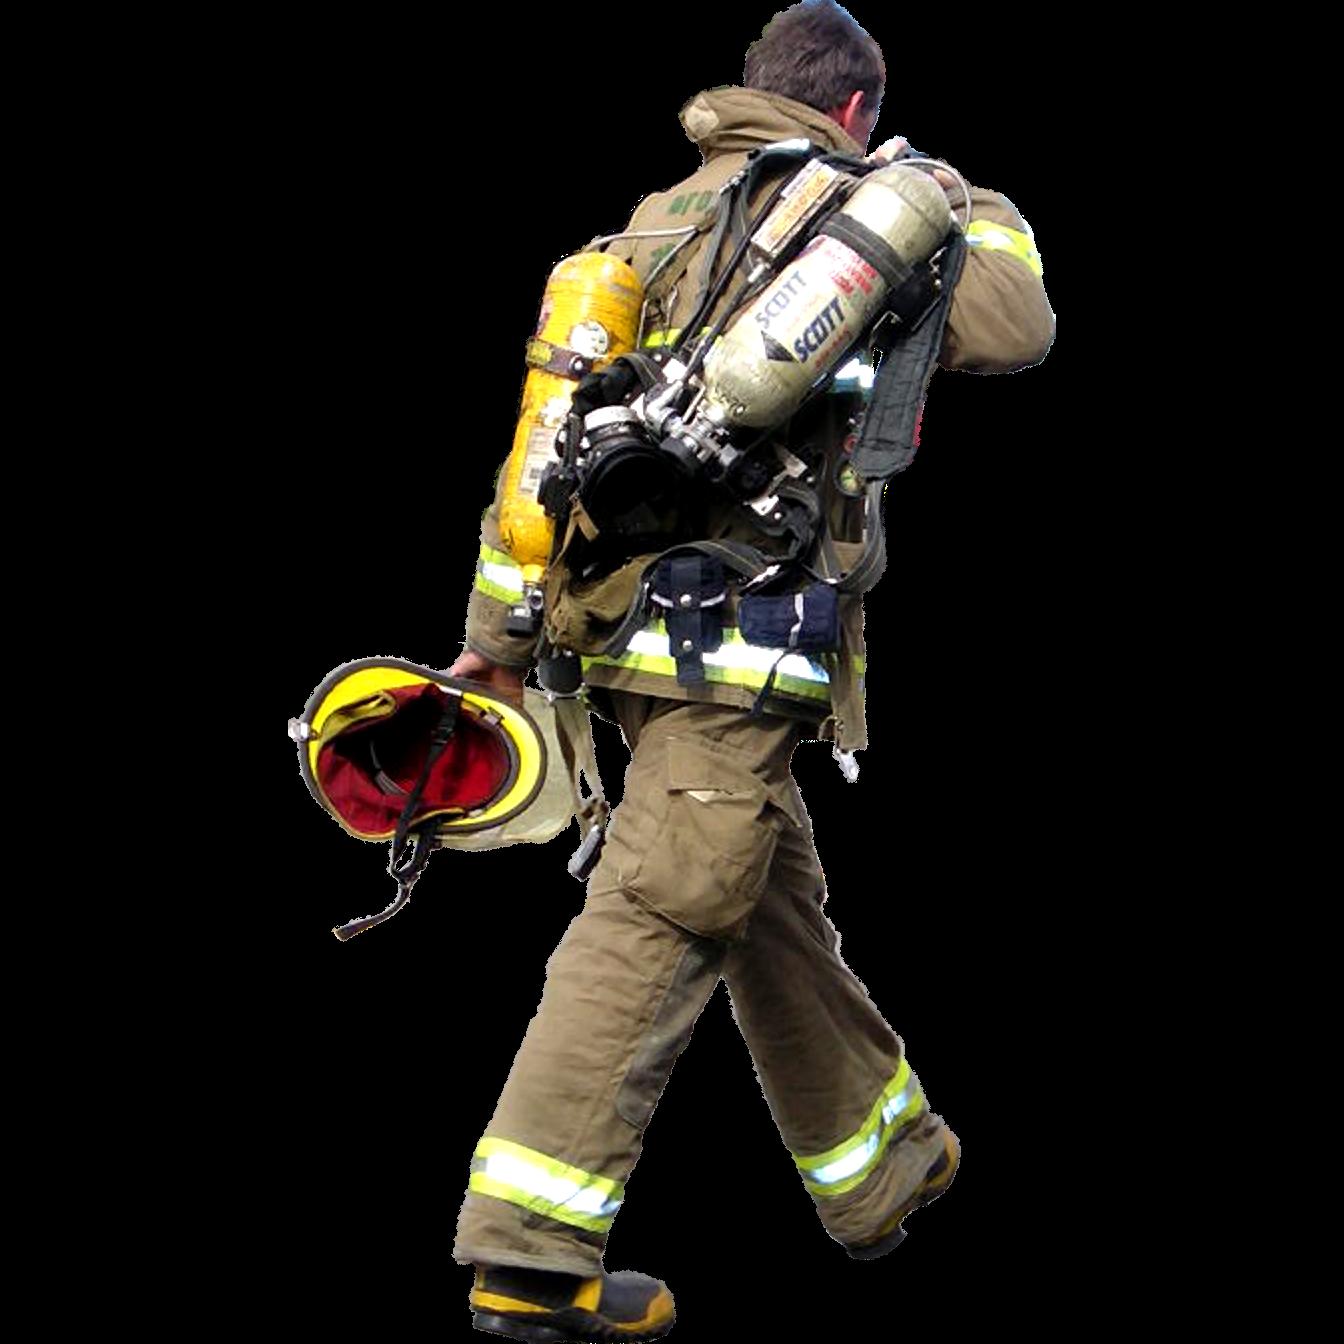 Fireman HD PNG - 96773